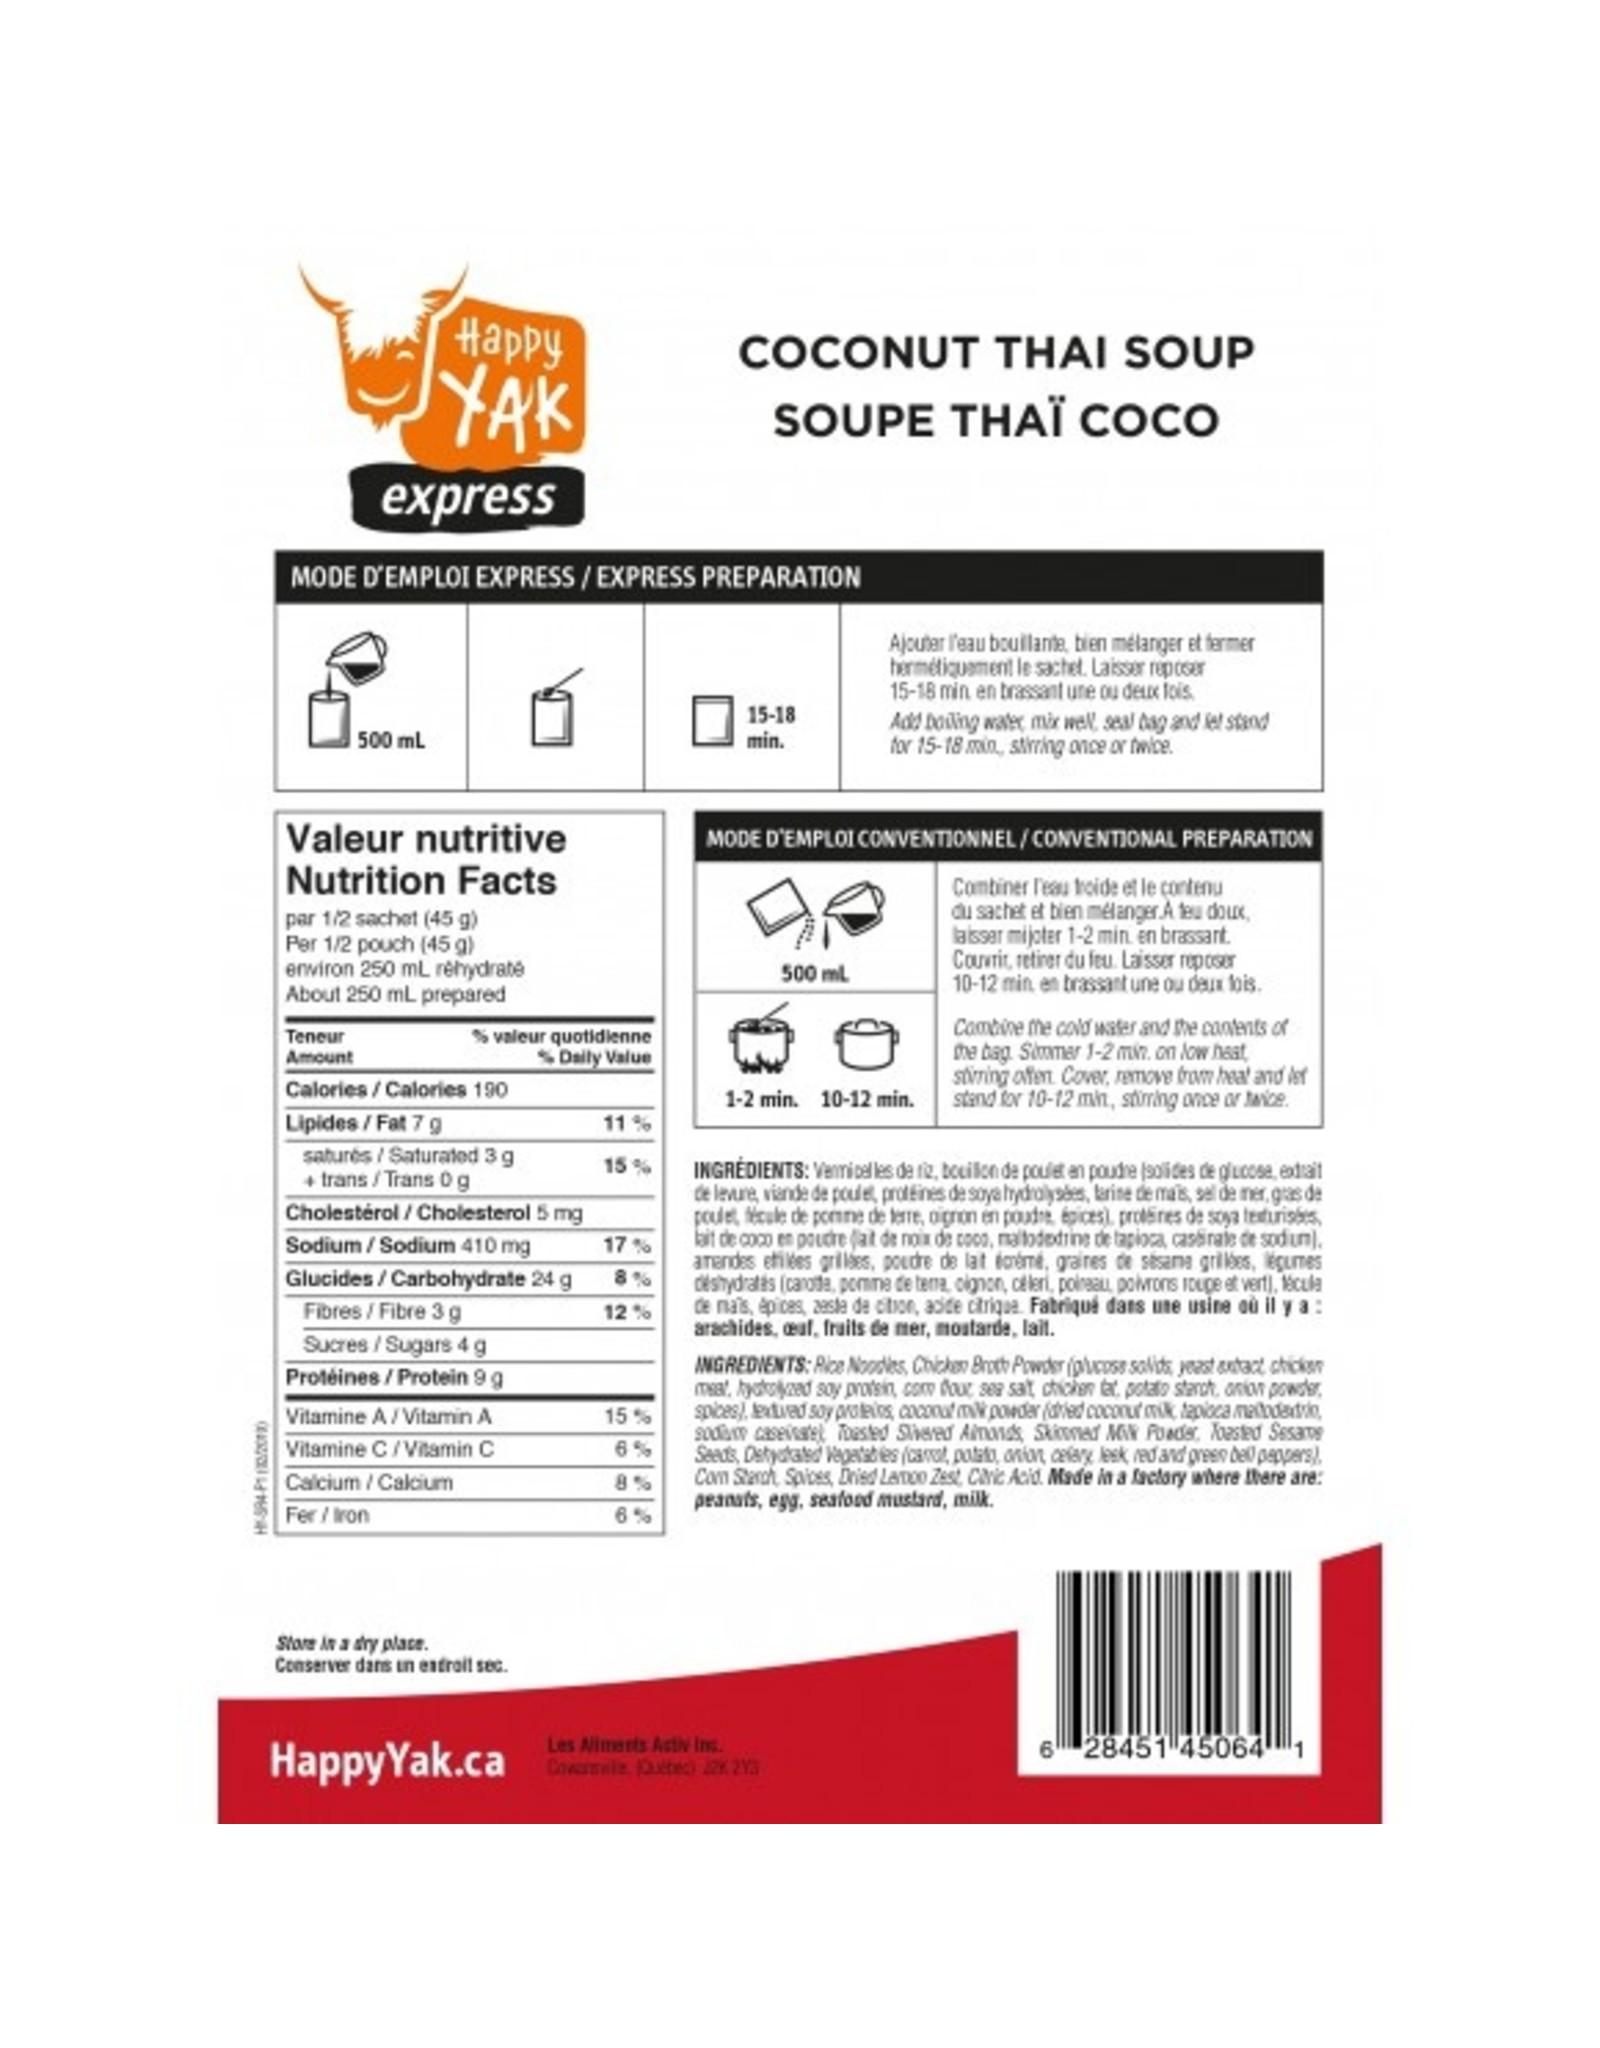 HAPPY YAK COCONUT THAI SOUP